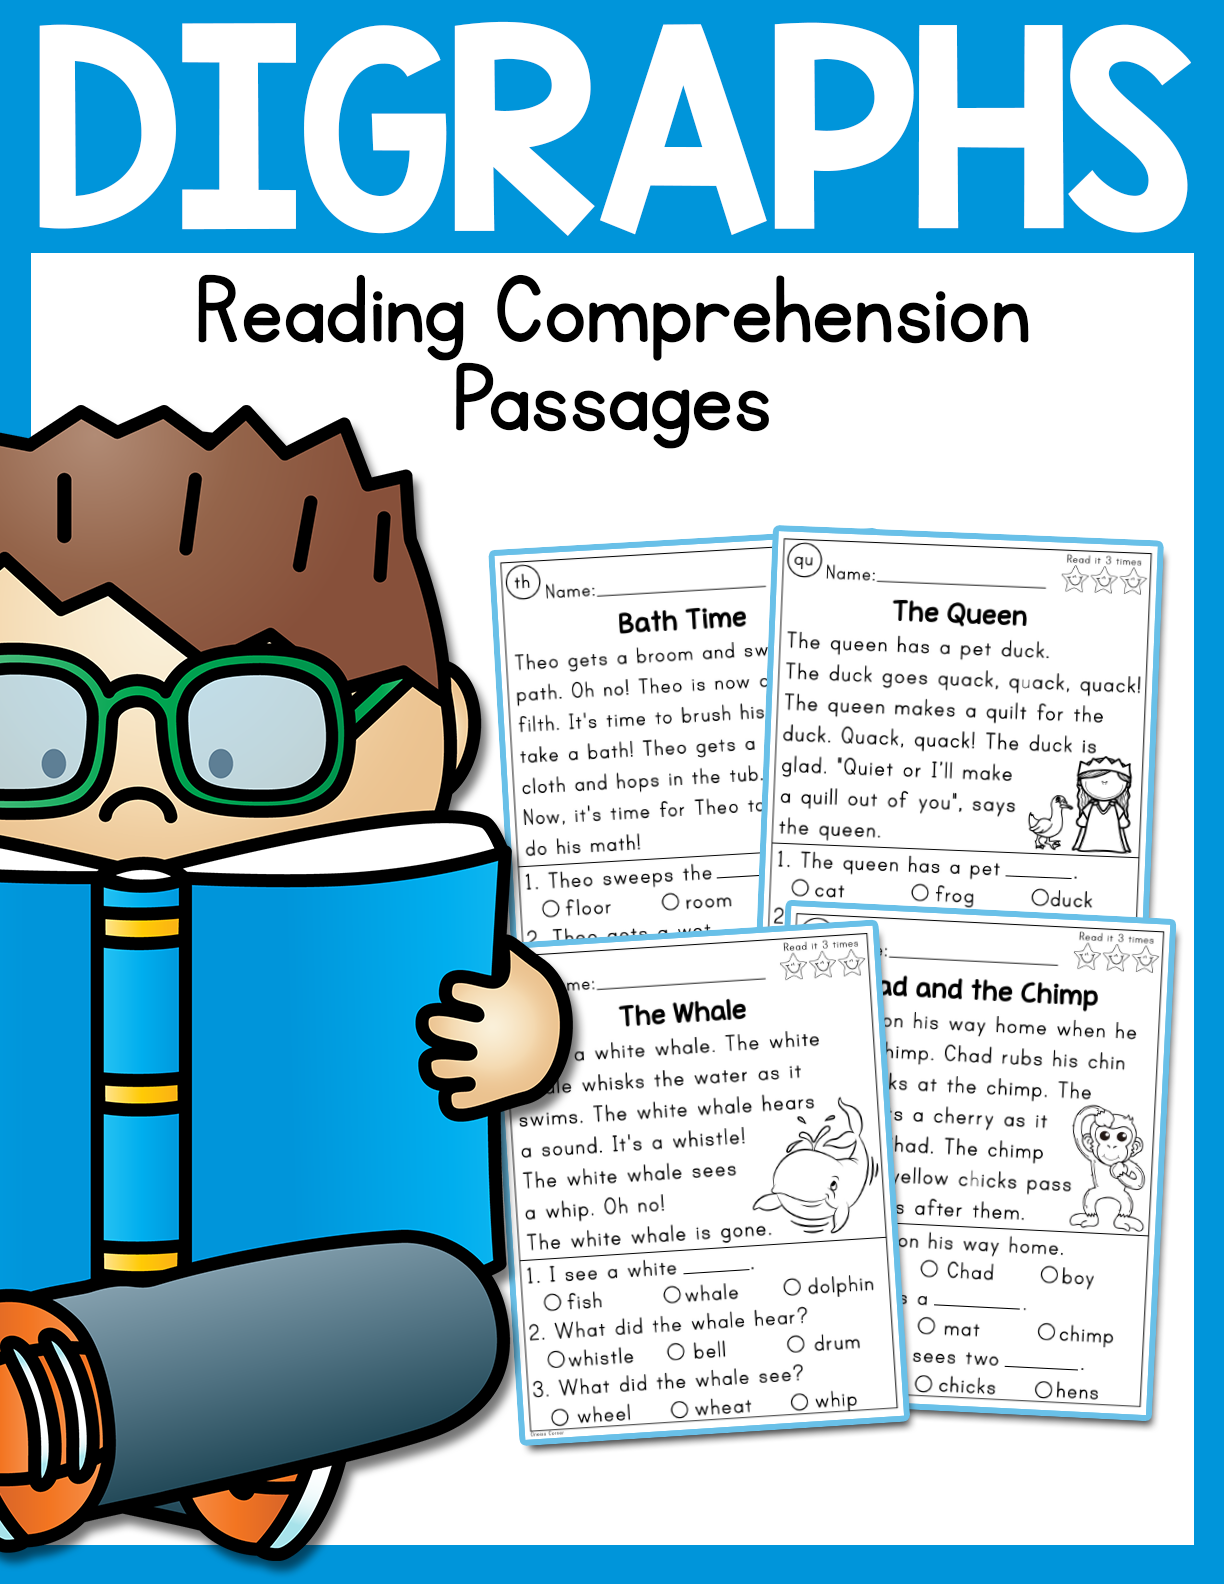 Digraphs Reading Comprehension Passages